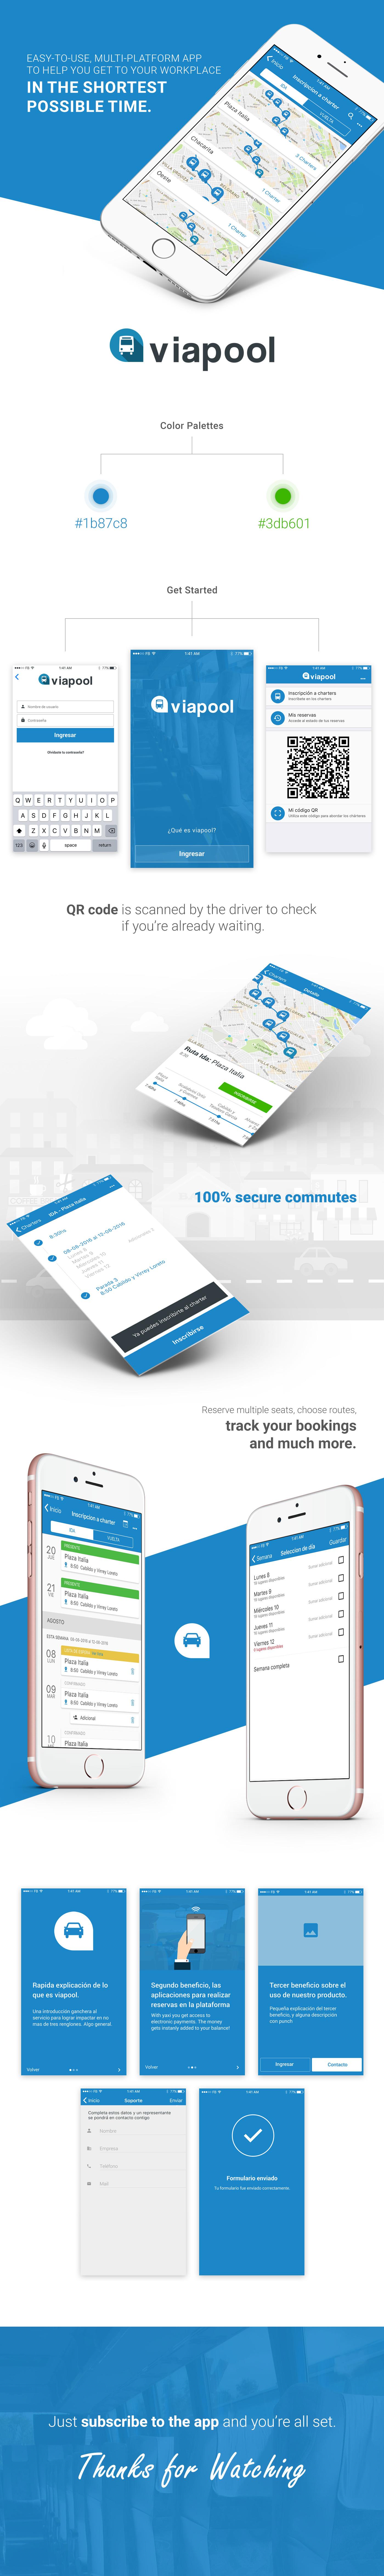 app-for-bus